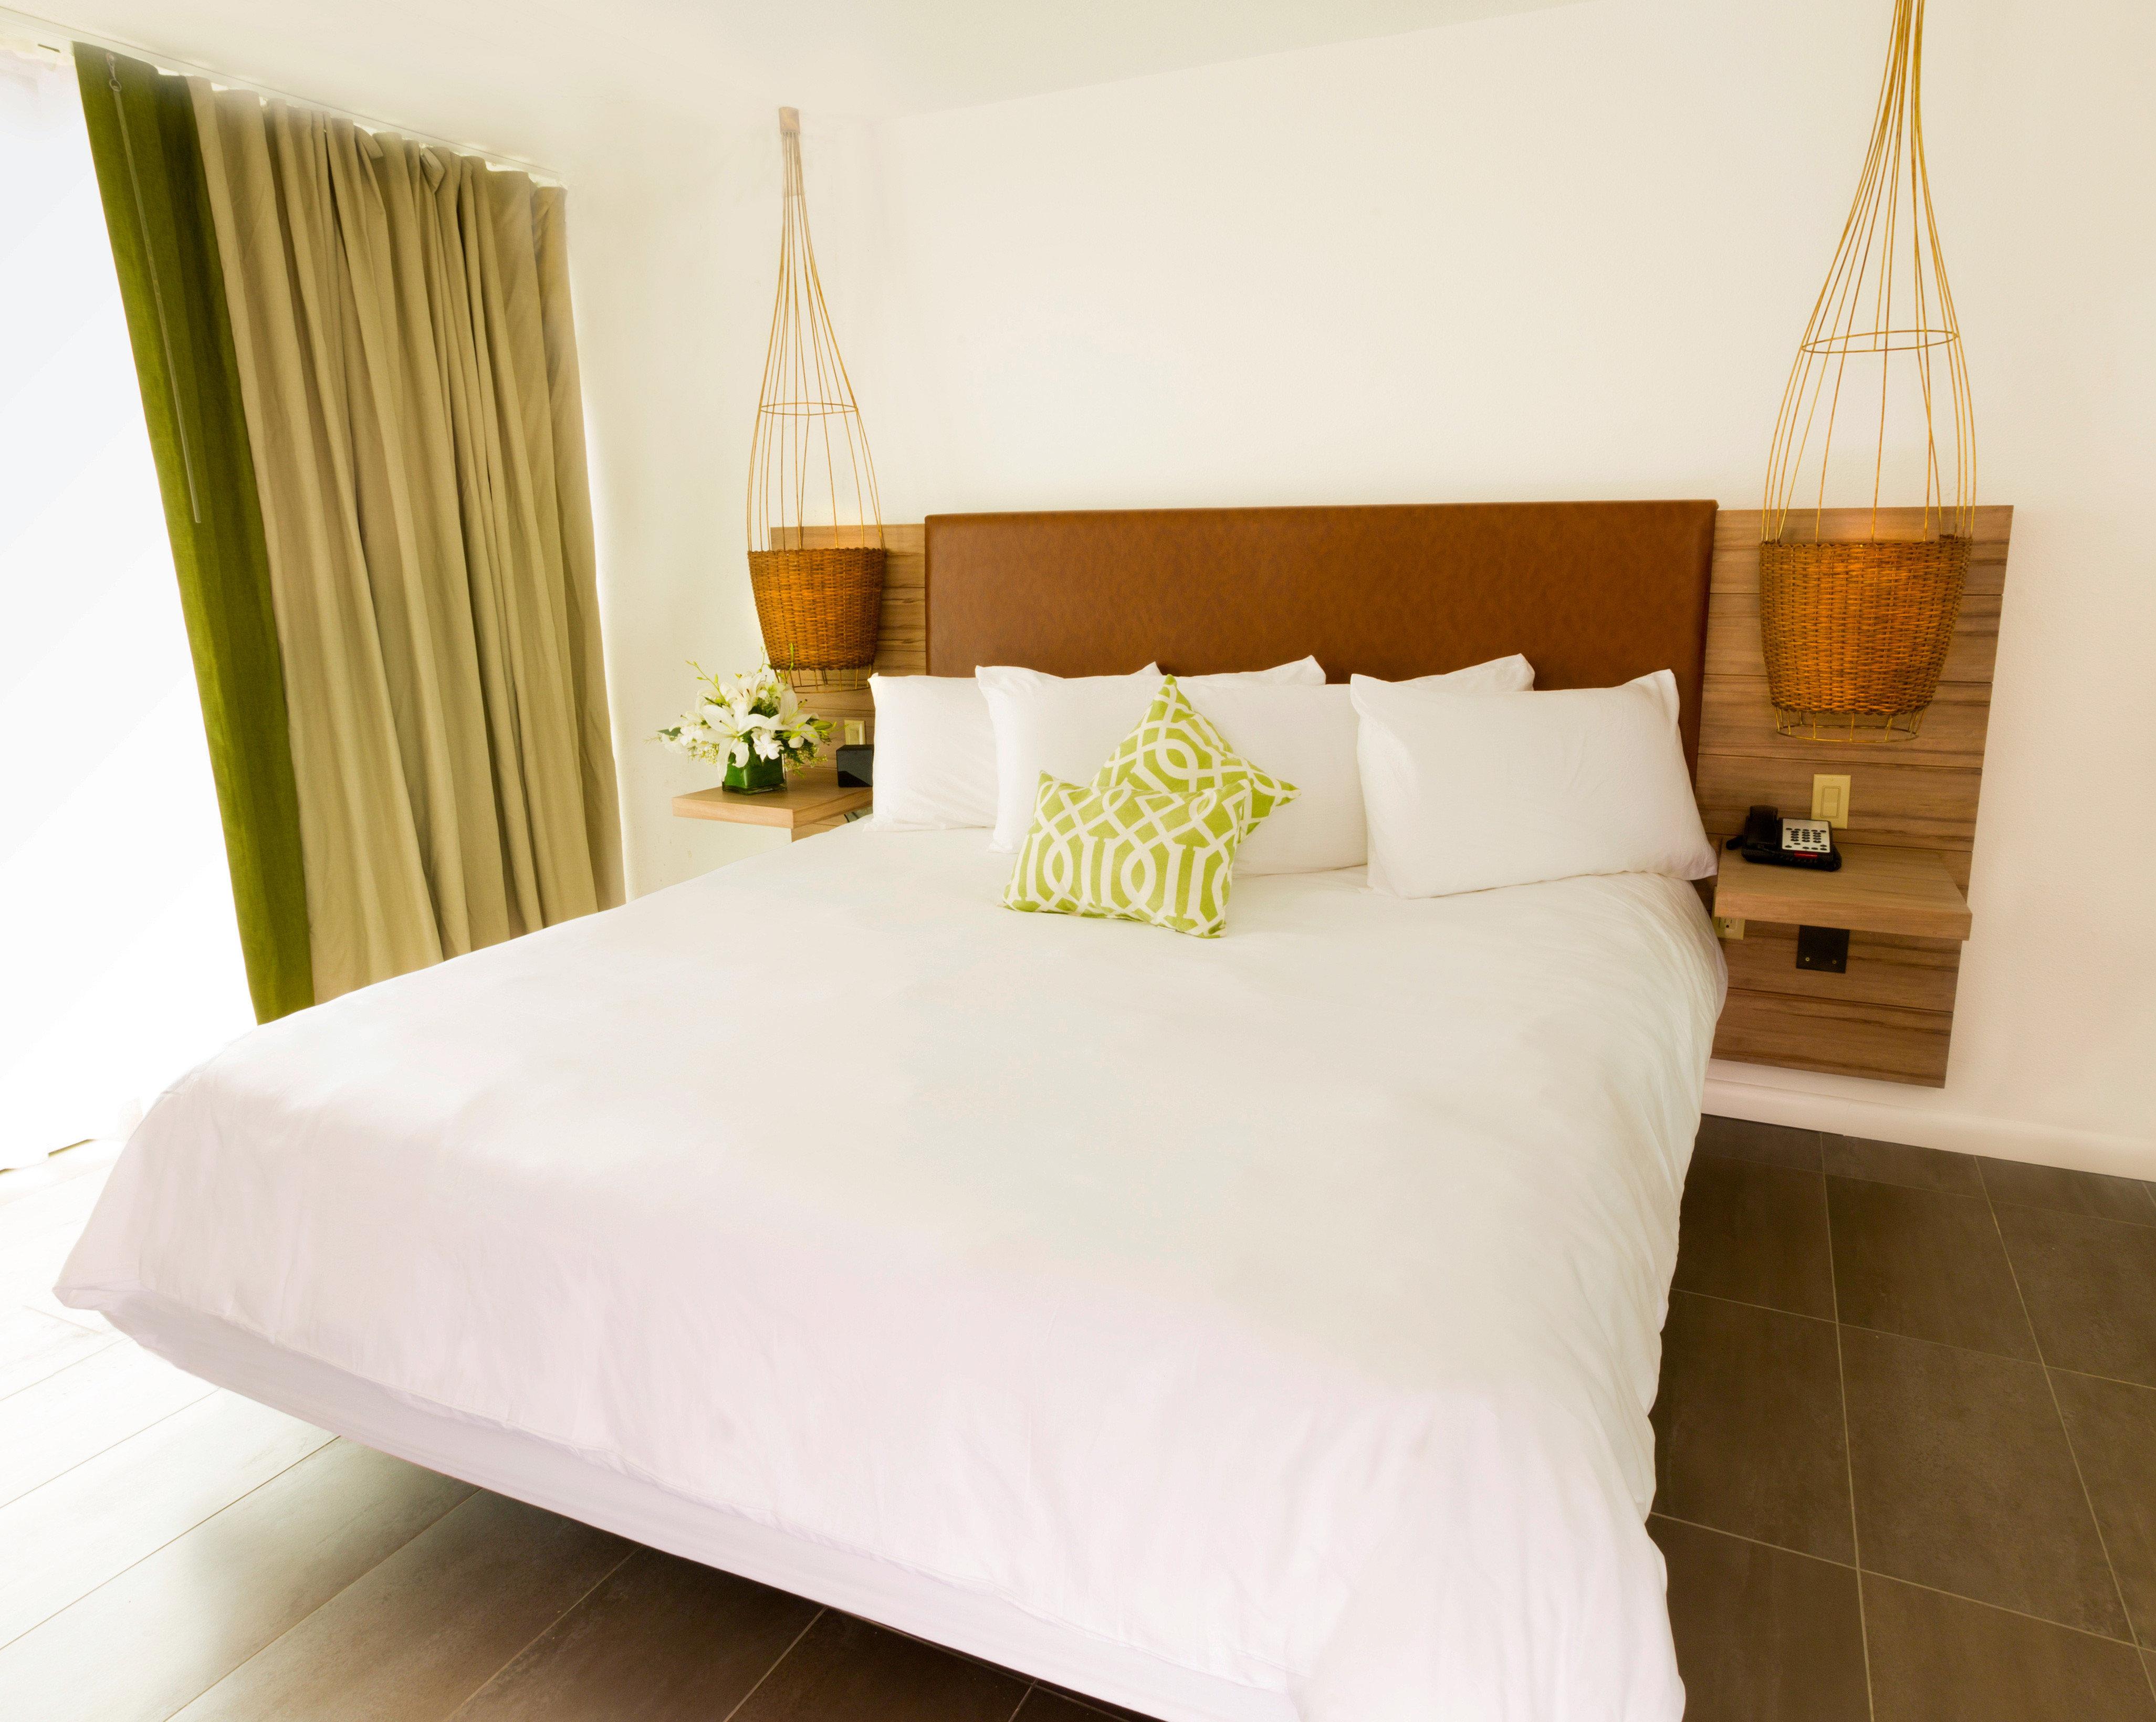 Beach Beachfront Bedroom Resort property Suite bed sheet white bed frame cottage duvet cover